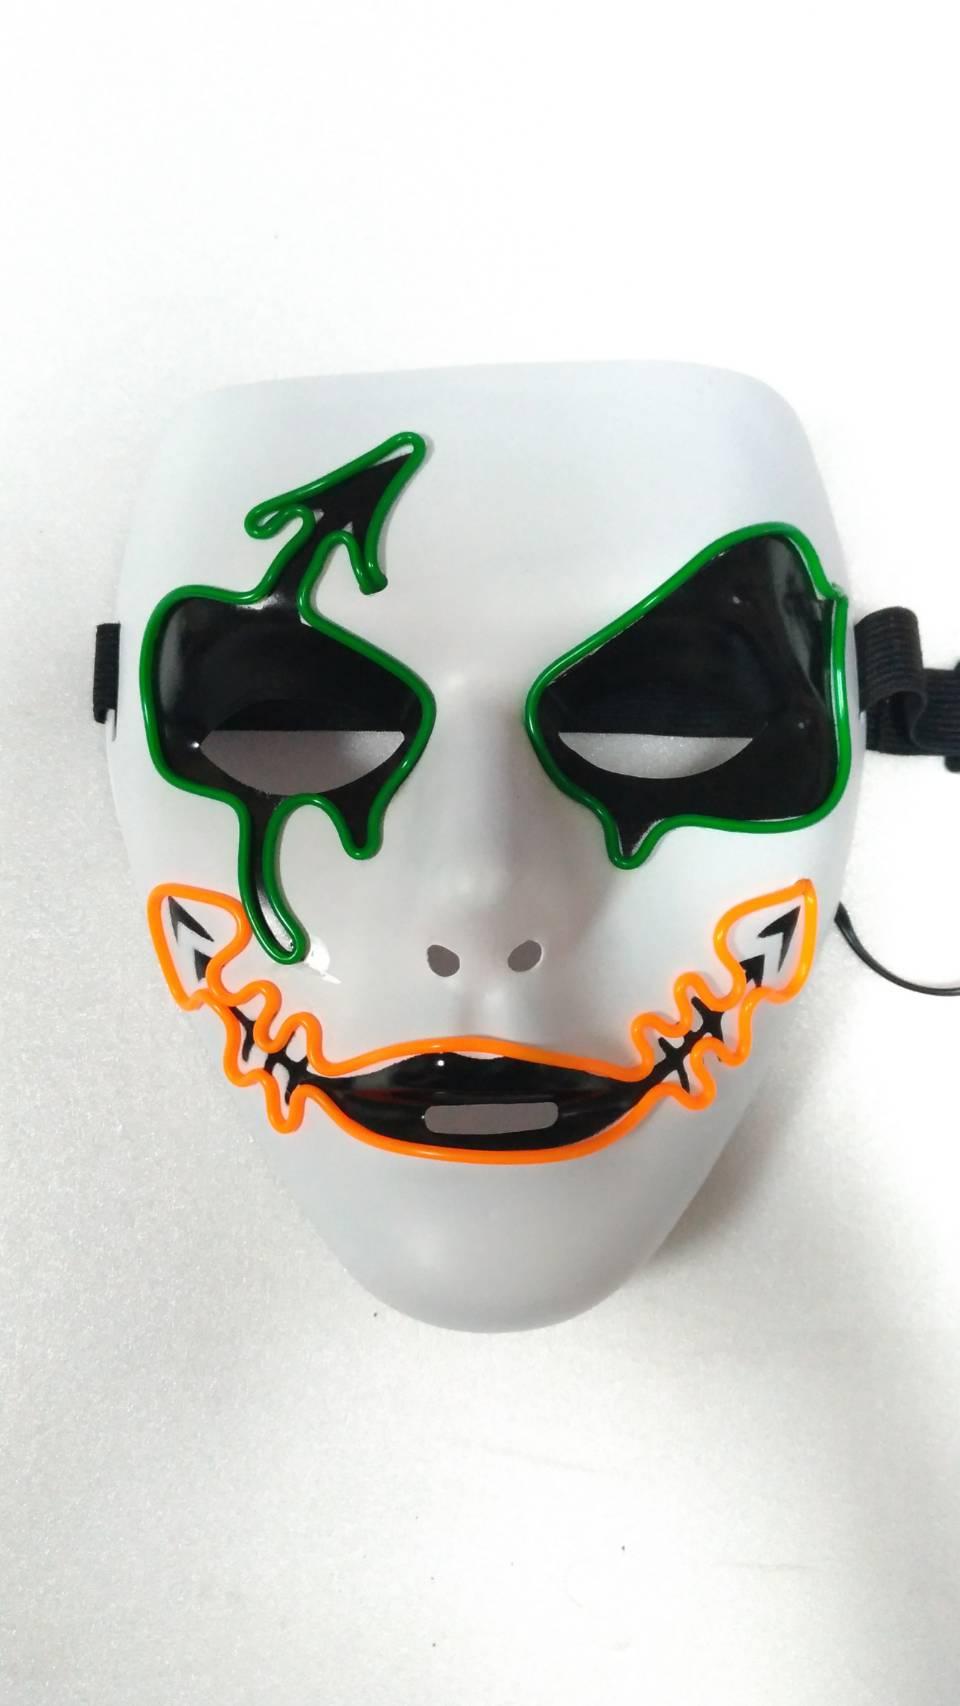 EL 冷光面具(蝙蝠小丑) 奪魂鋸 杰森殺手 死神/眼罩 黑崎一戶 cosplay【塔克】